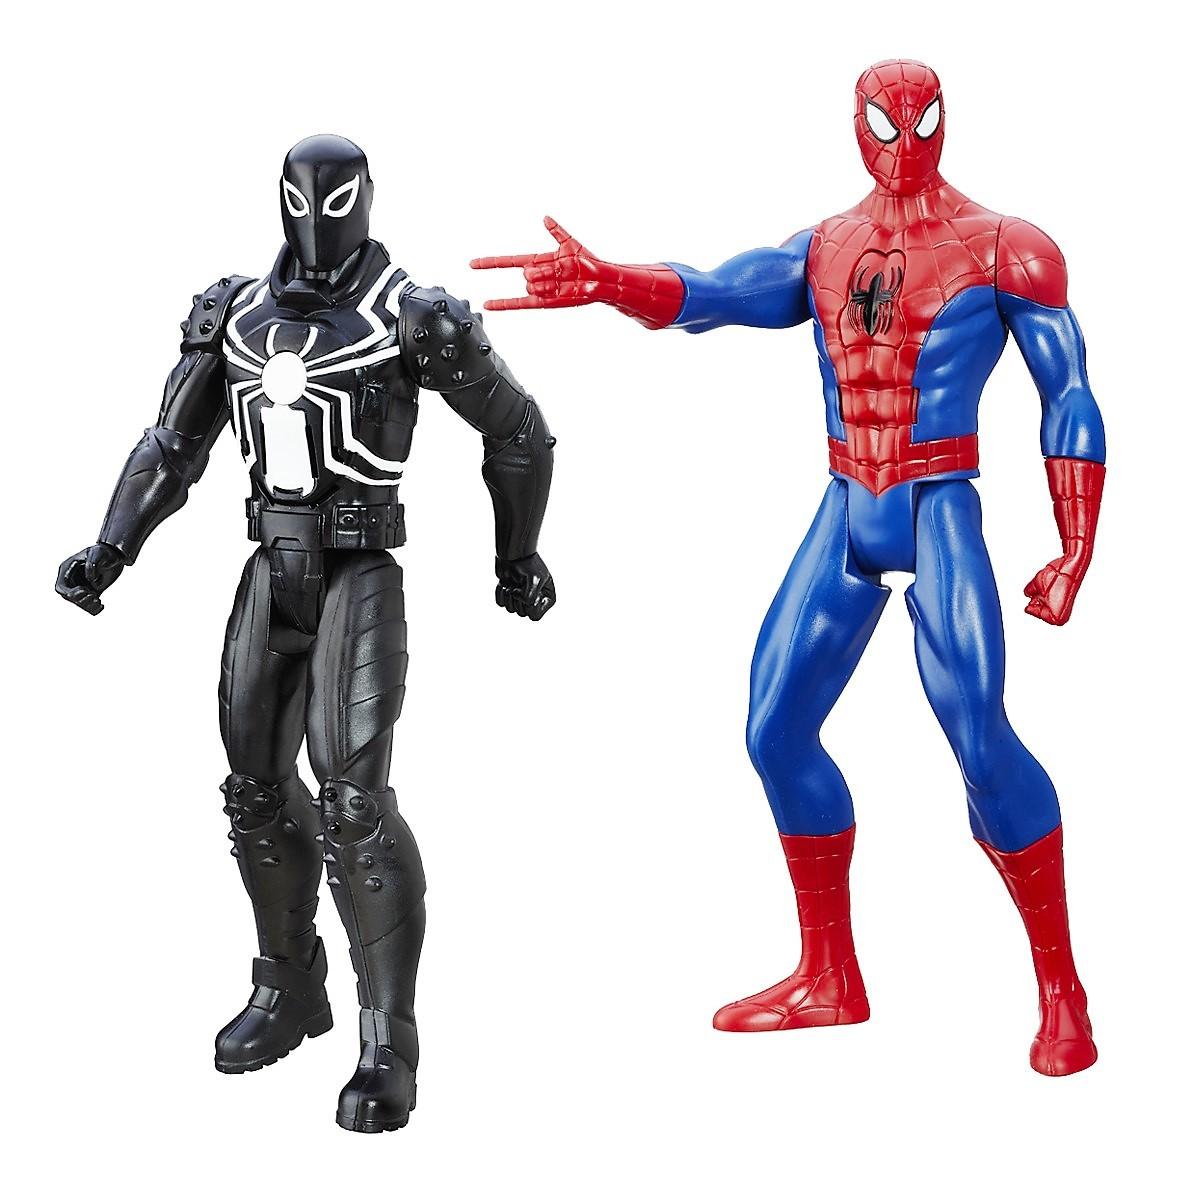 Электронные фигурки Человека-Паука из серии Spider-Man ТитаныSpider-Man (Игрушки Человек Паук)<br>Электронные фигурки Человека-Паука из серии Spider-Man Титаны<br>